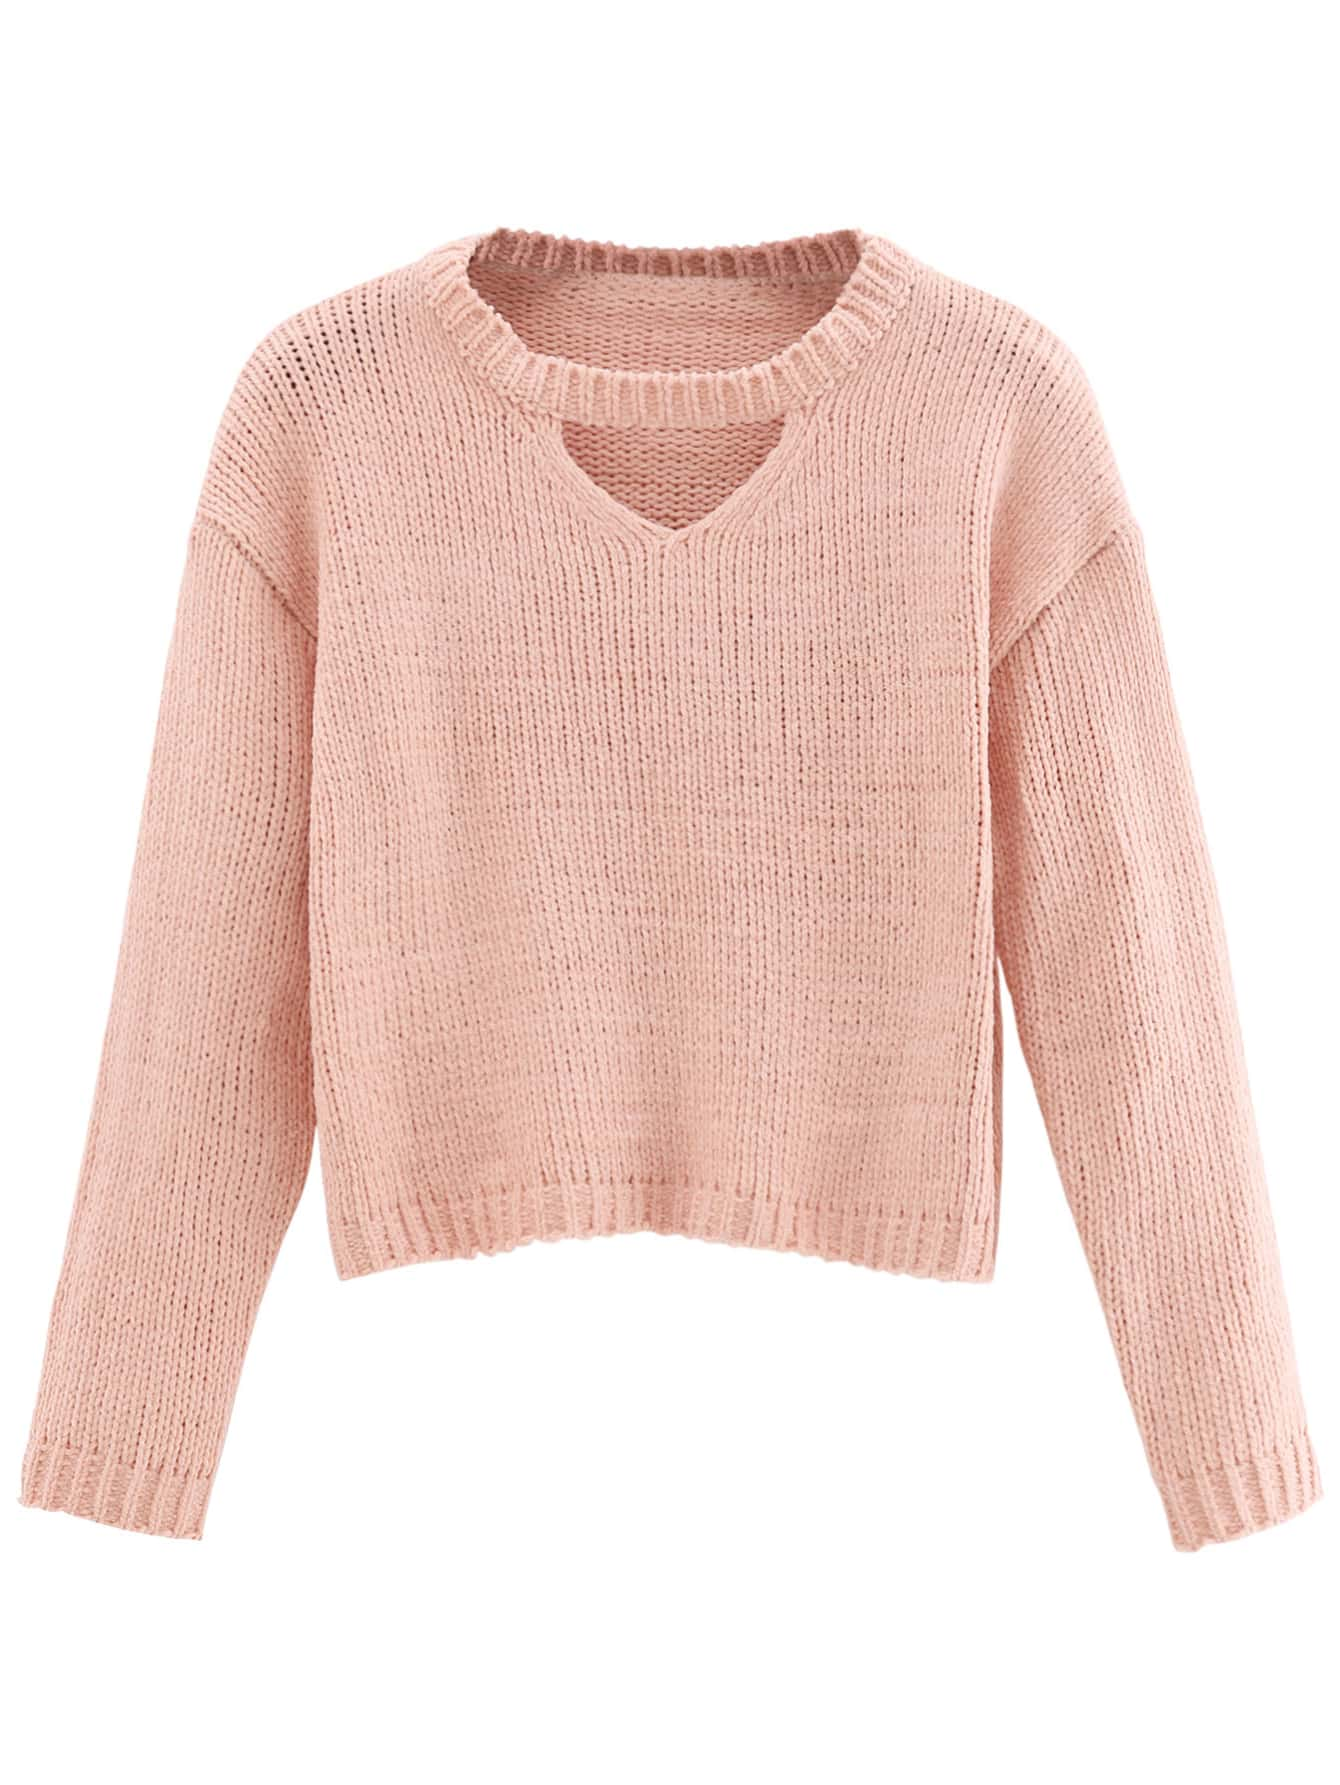 sweater160914001_2